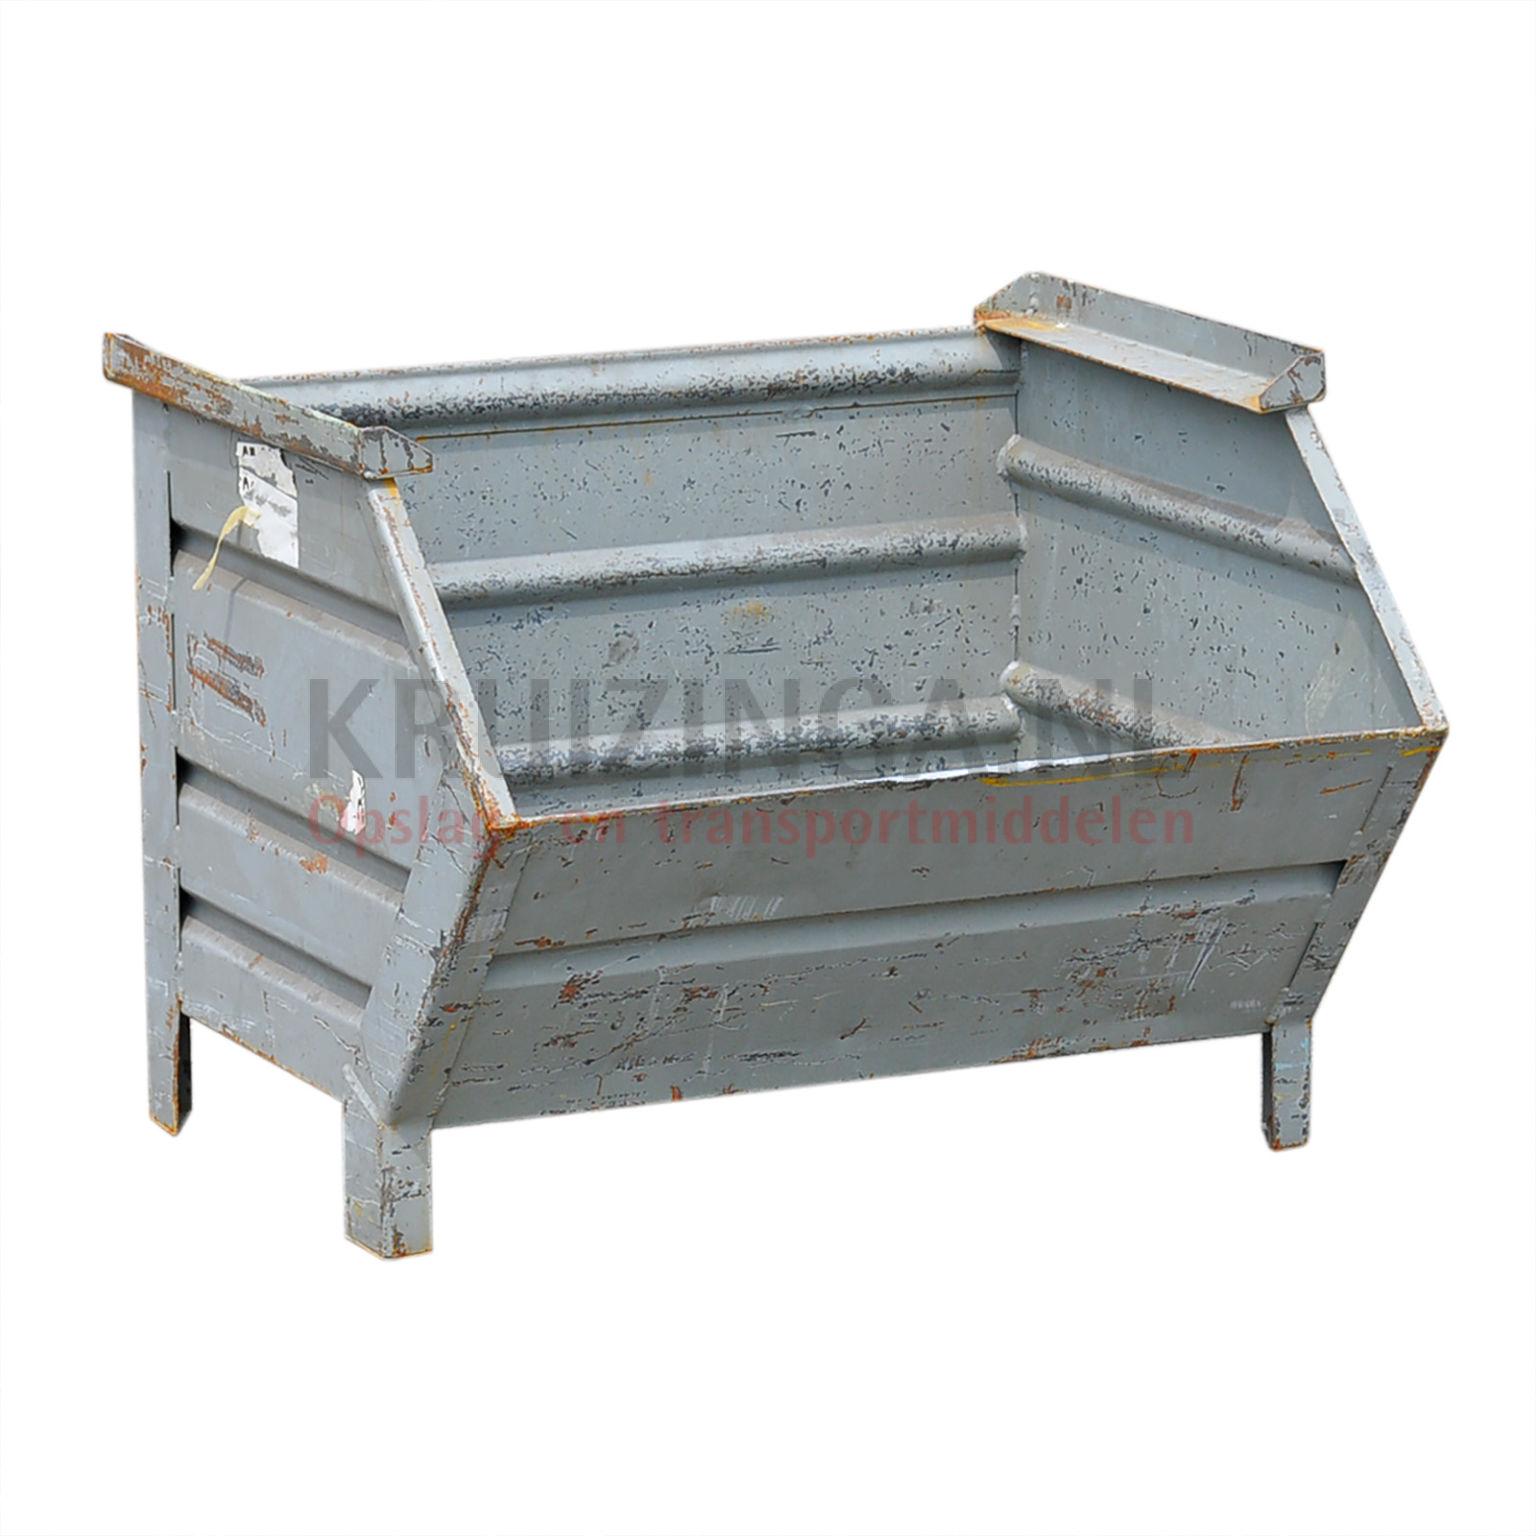 bac de rangement acier construction robuste bac empilable poign e inclin occasion. Black Bedroom Furniture Sets. Home Design Ideas